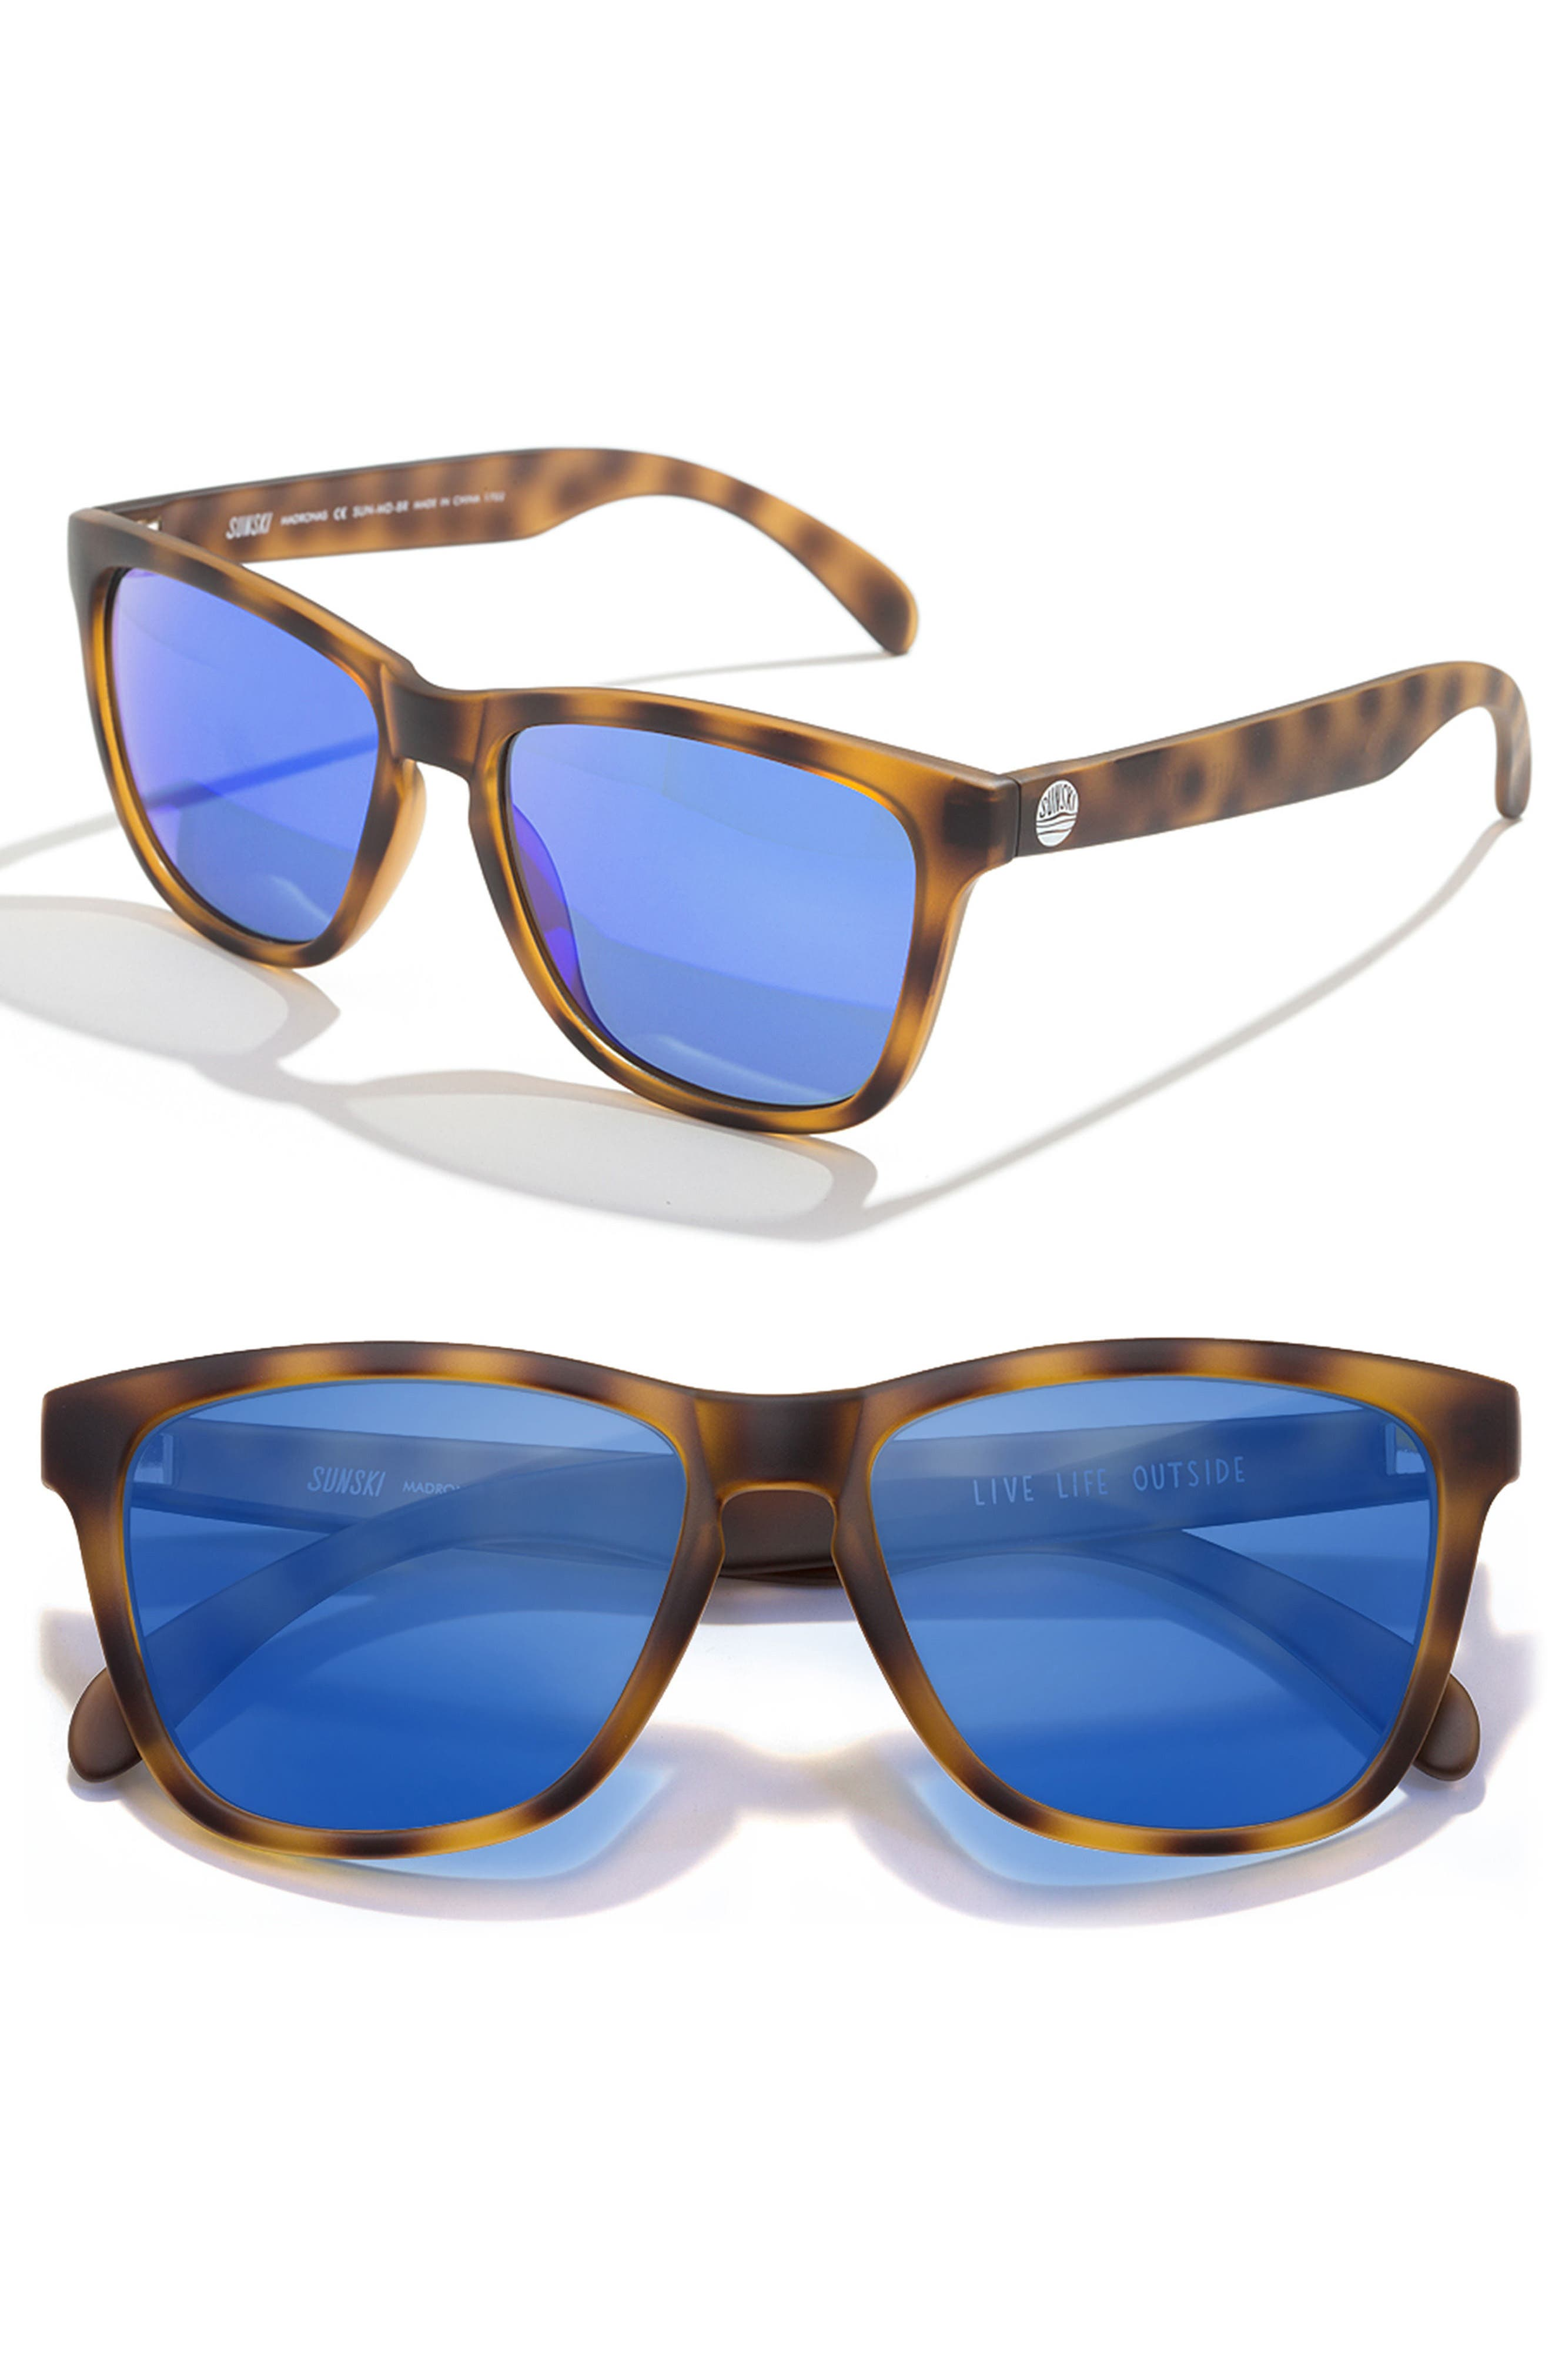 Madrona 53mm Polarized Sunglasses,                             Main thumbnail 1, color,                             TORTOISE/BLUE